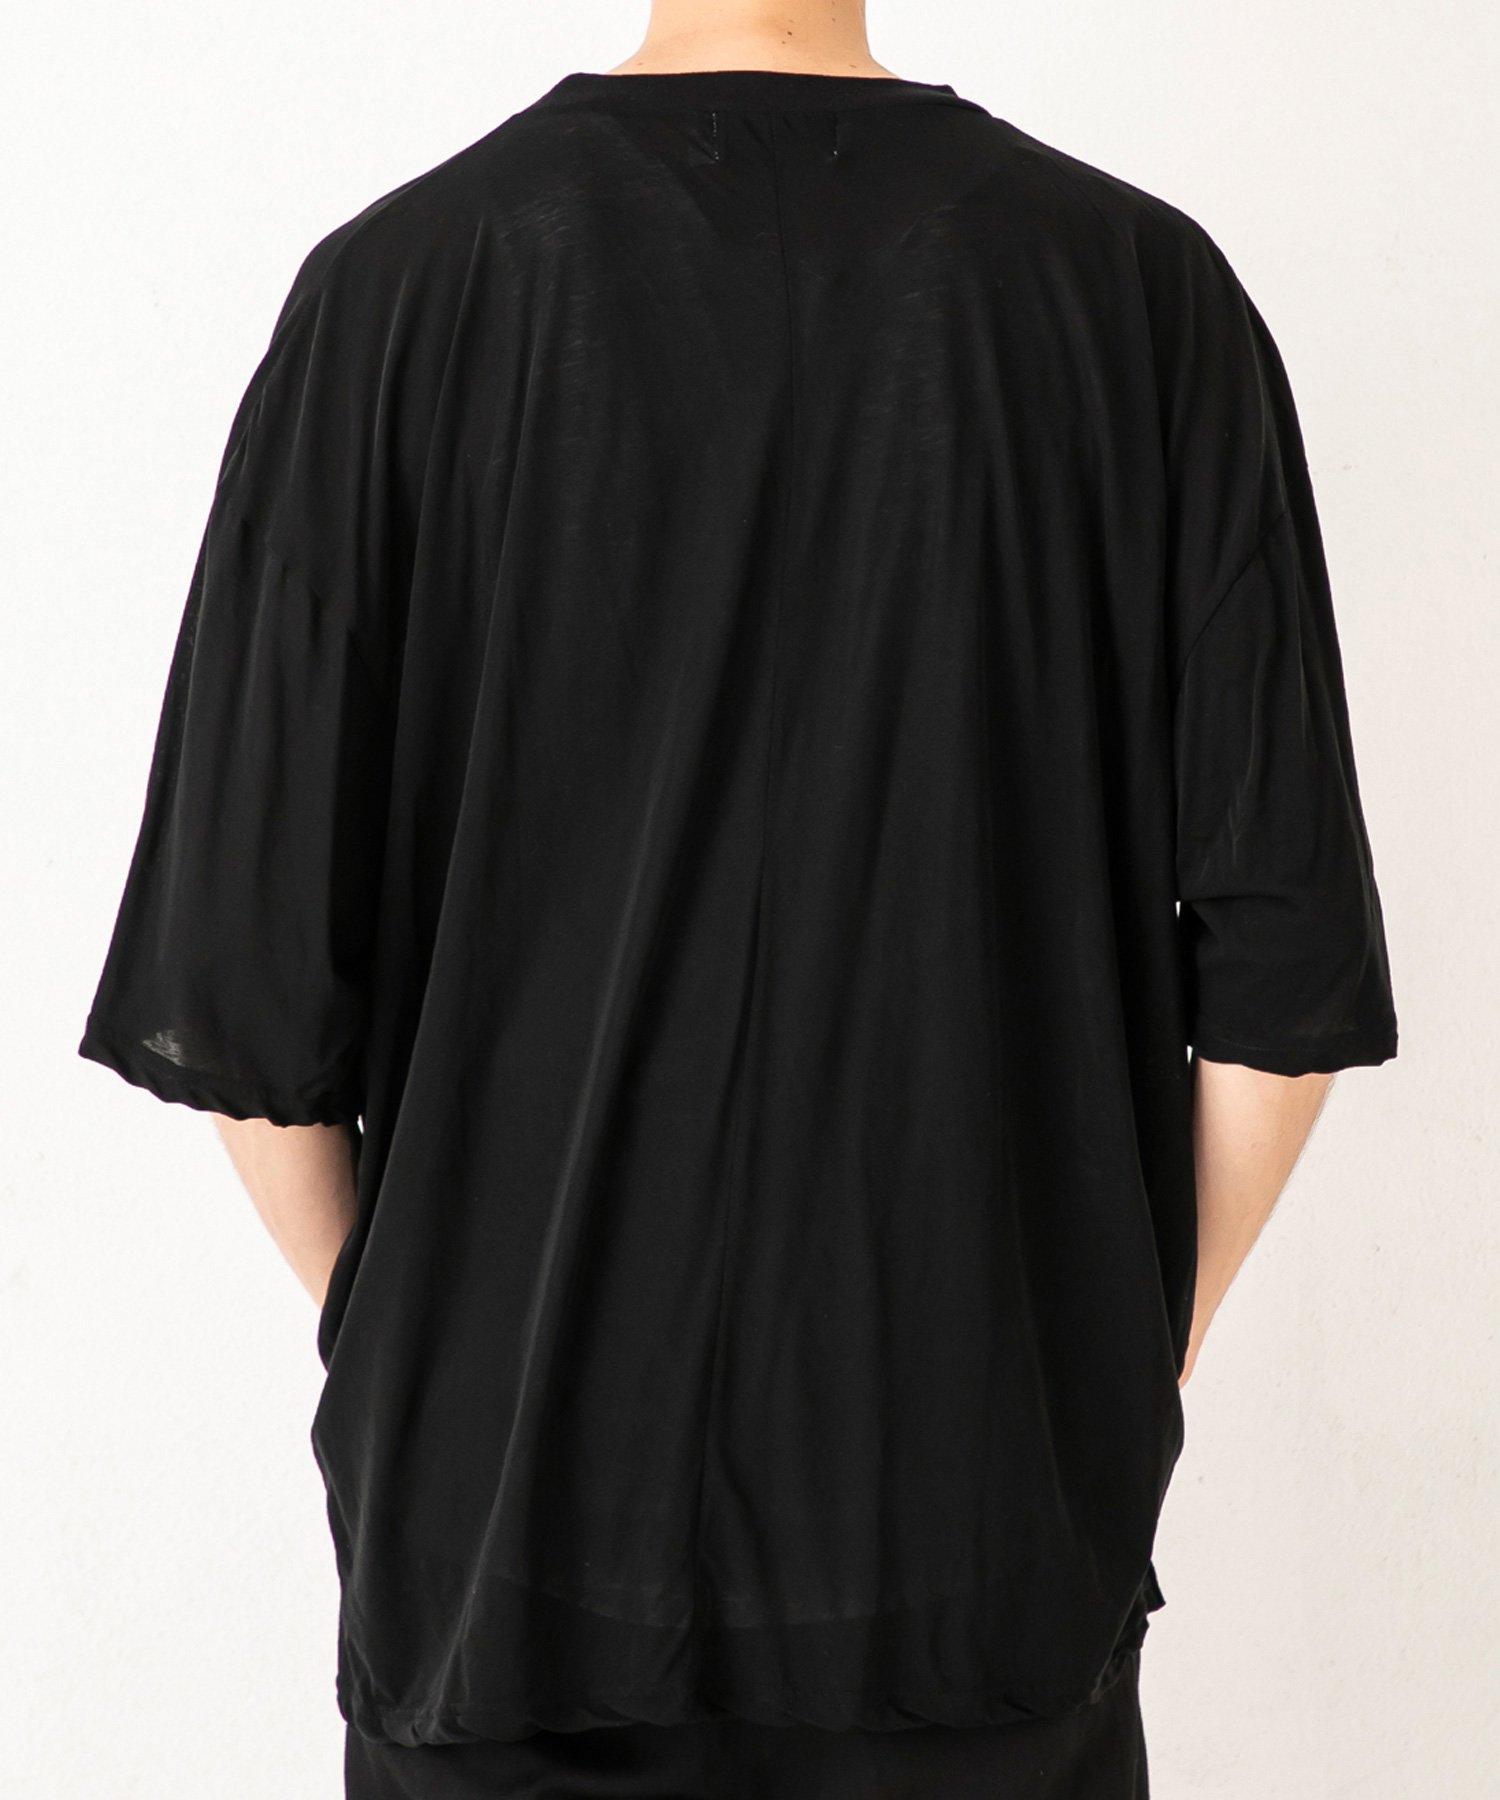 PKT TEE【Black】&【Navy】